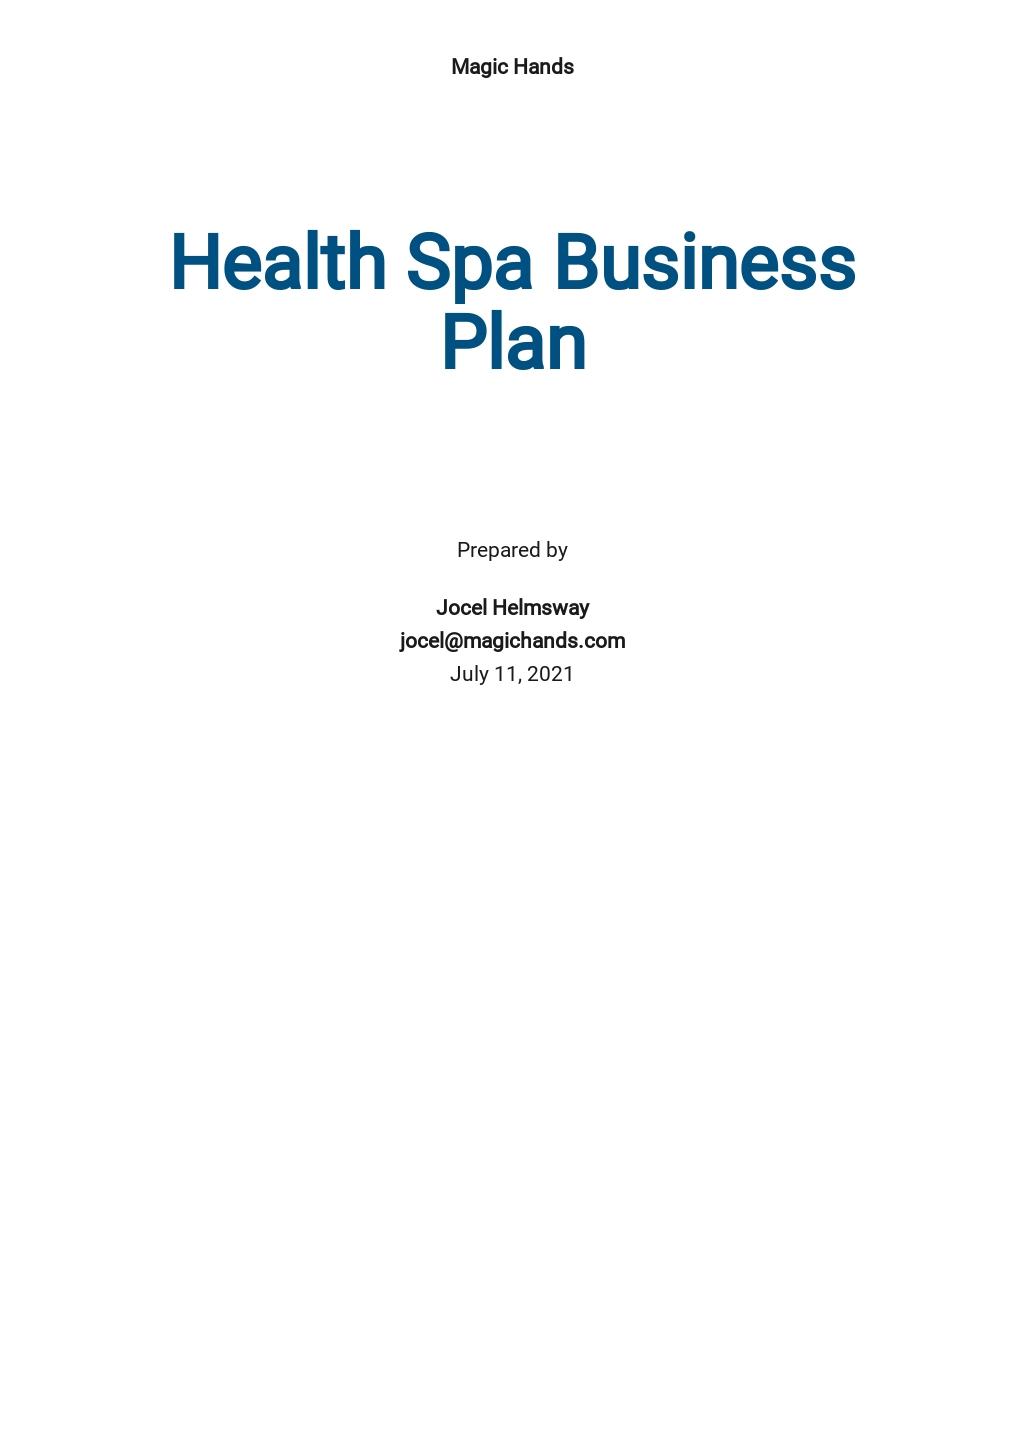 Health Spa Business Plan Template